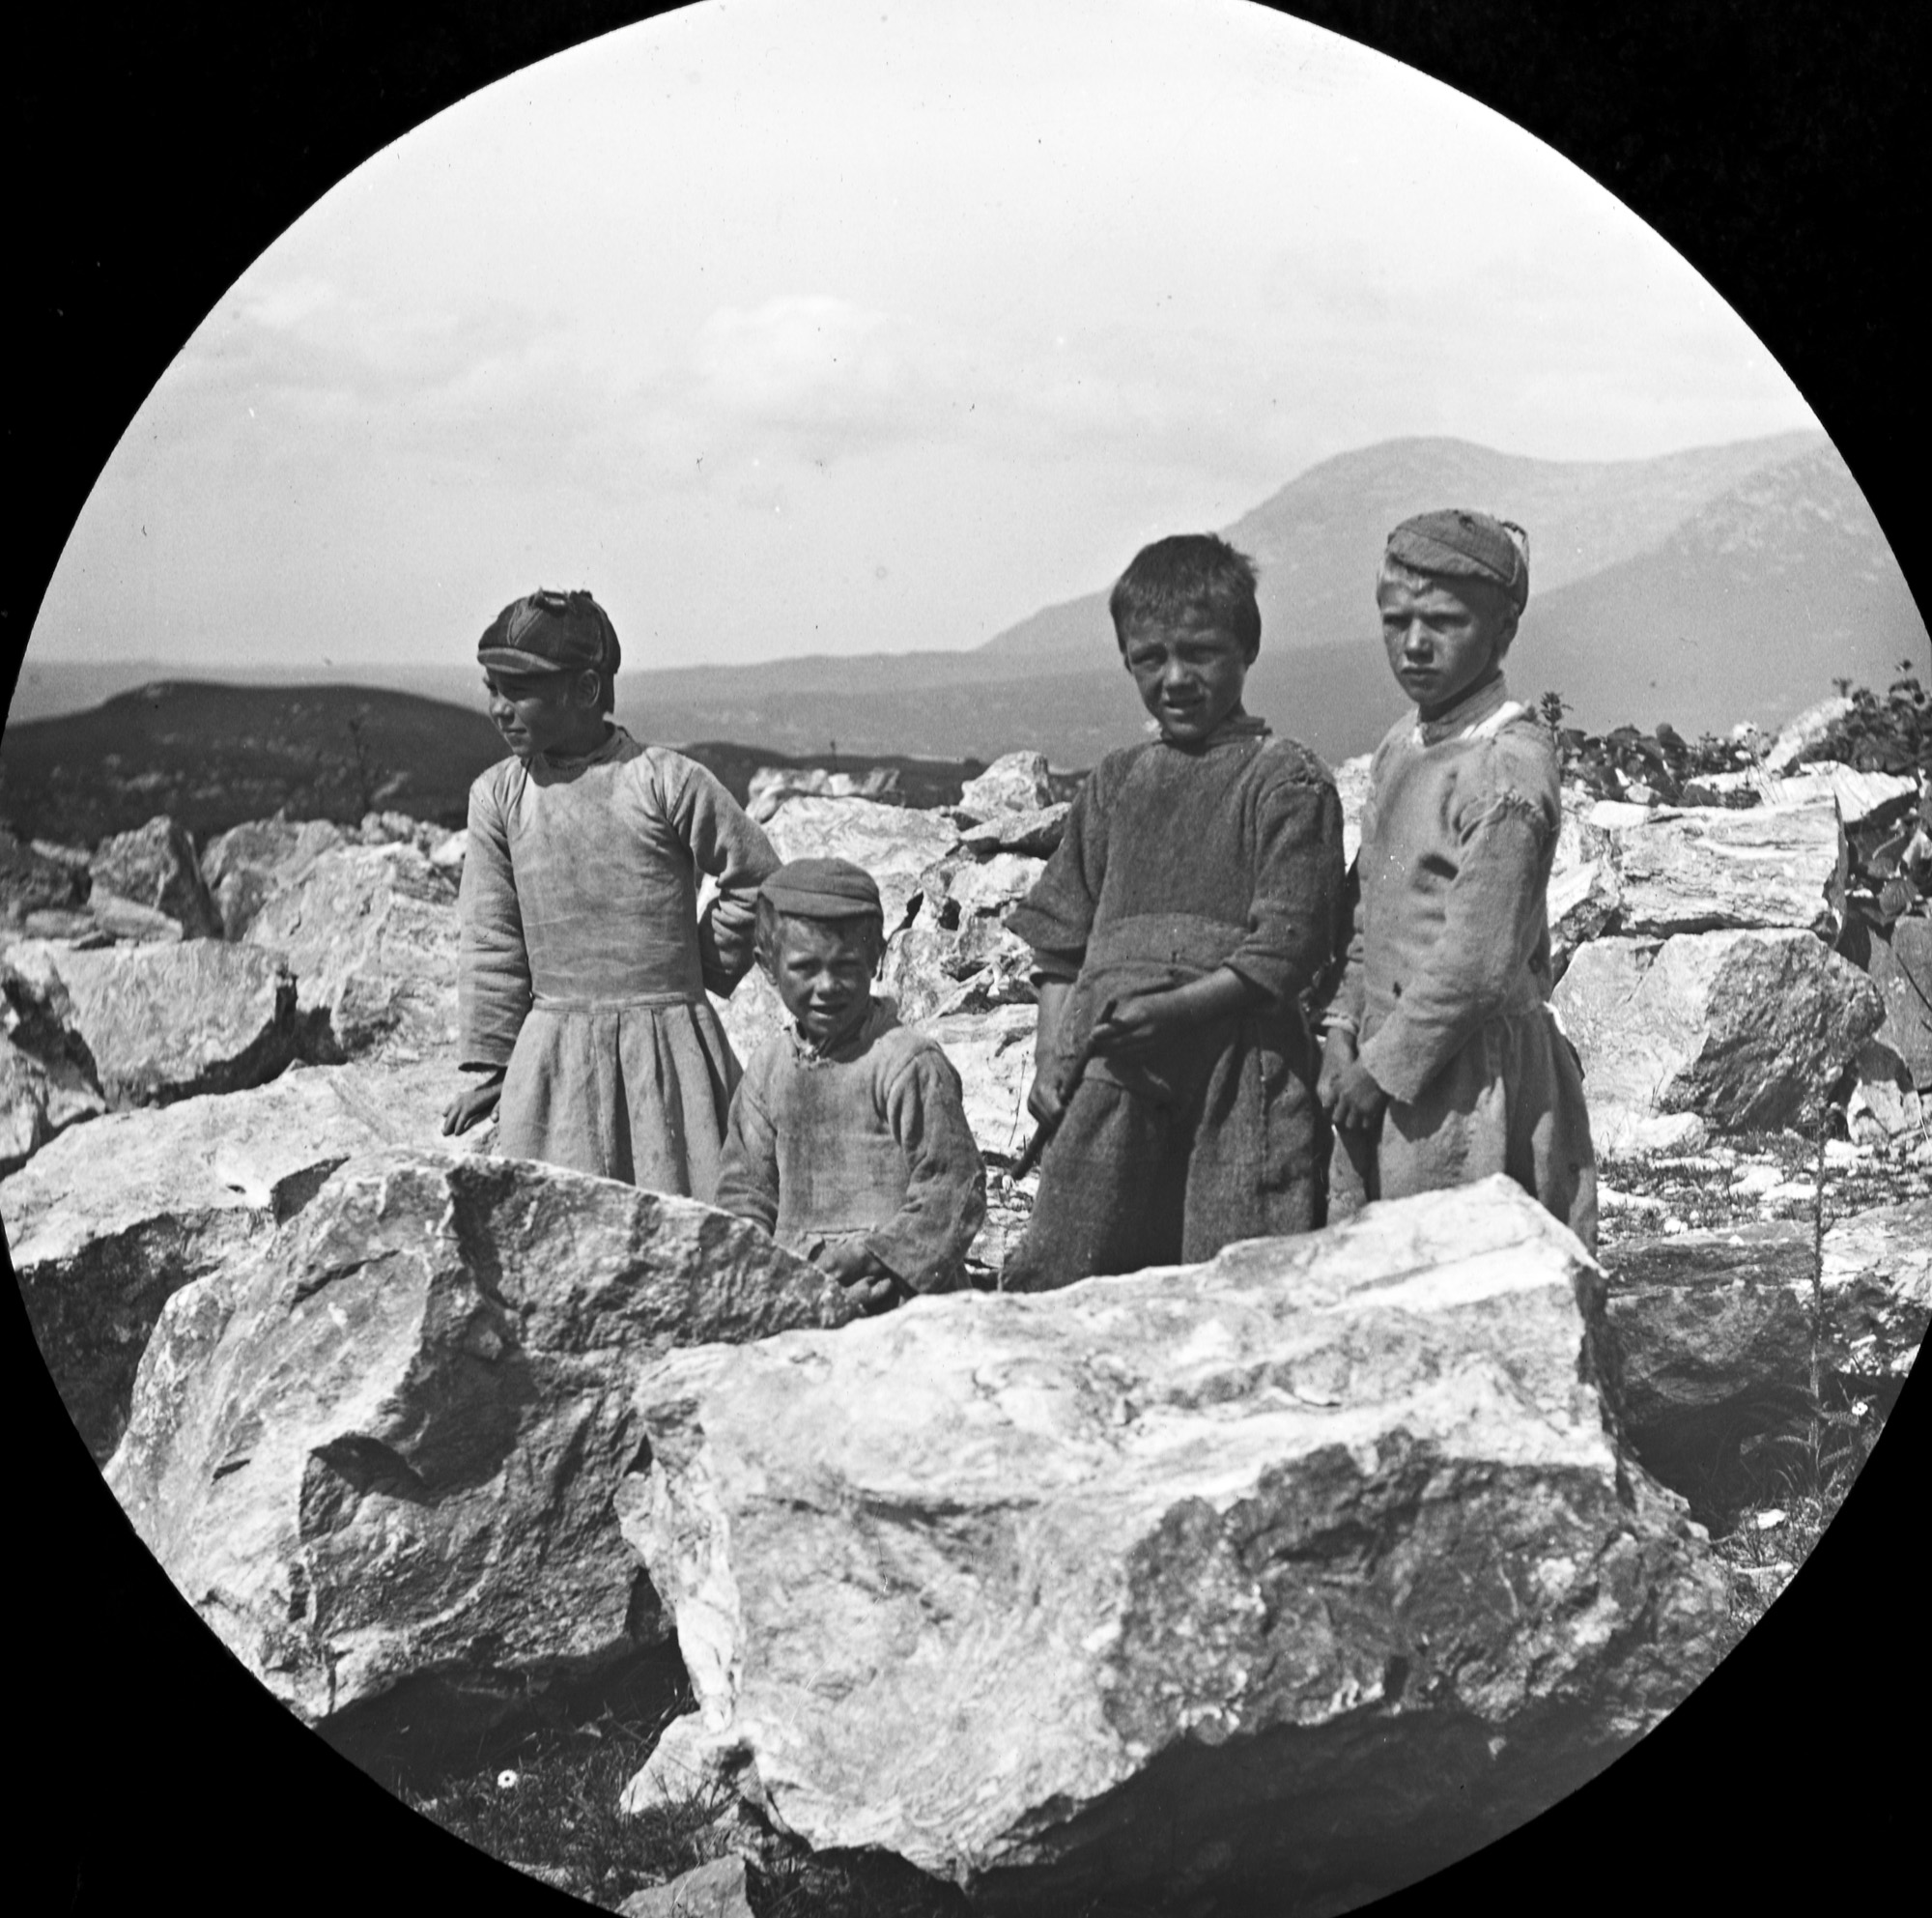 Children on the rocks?